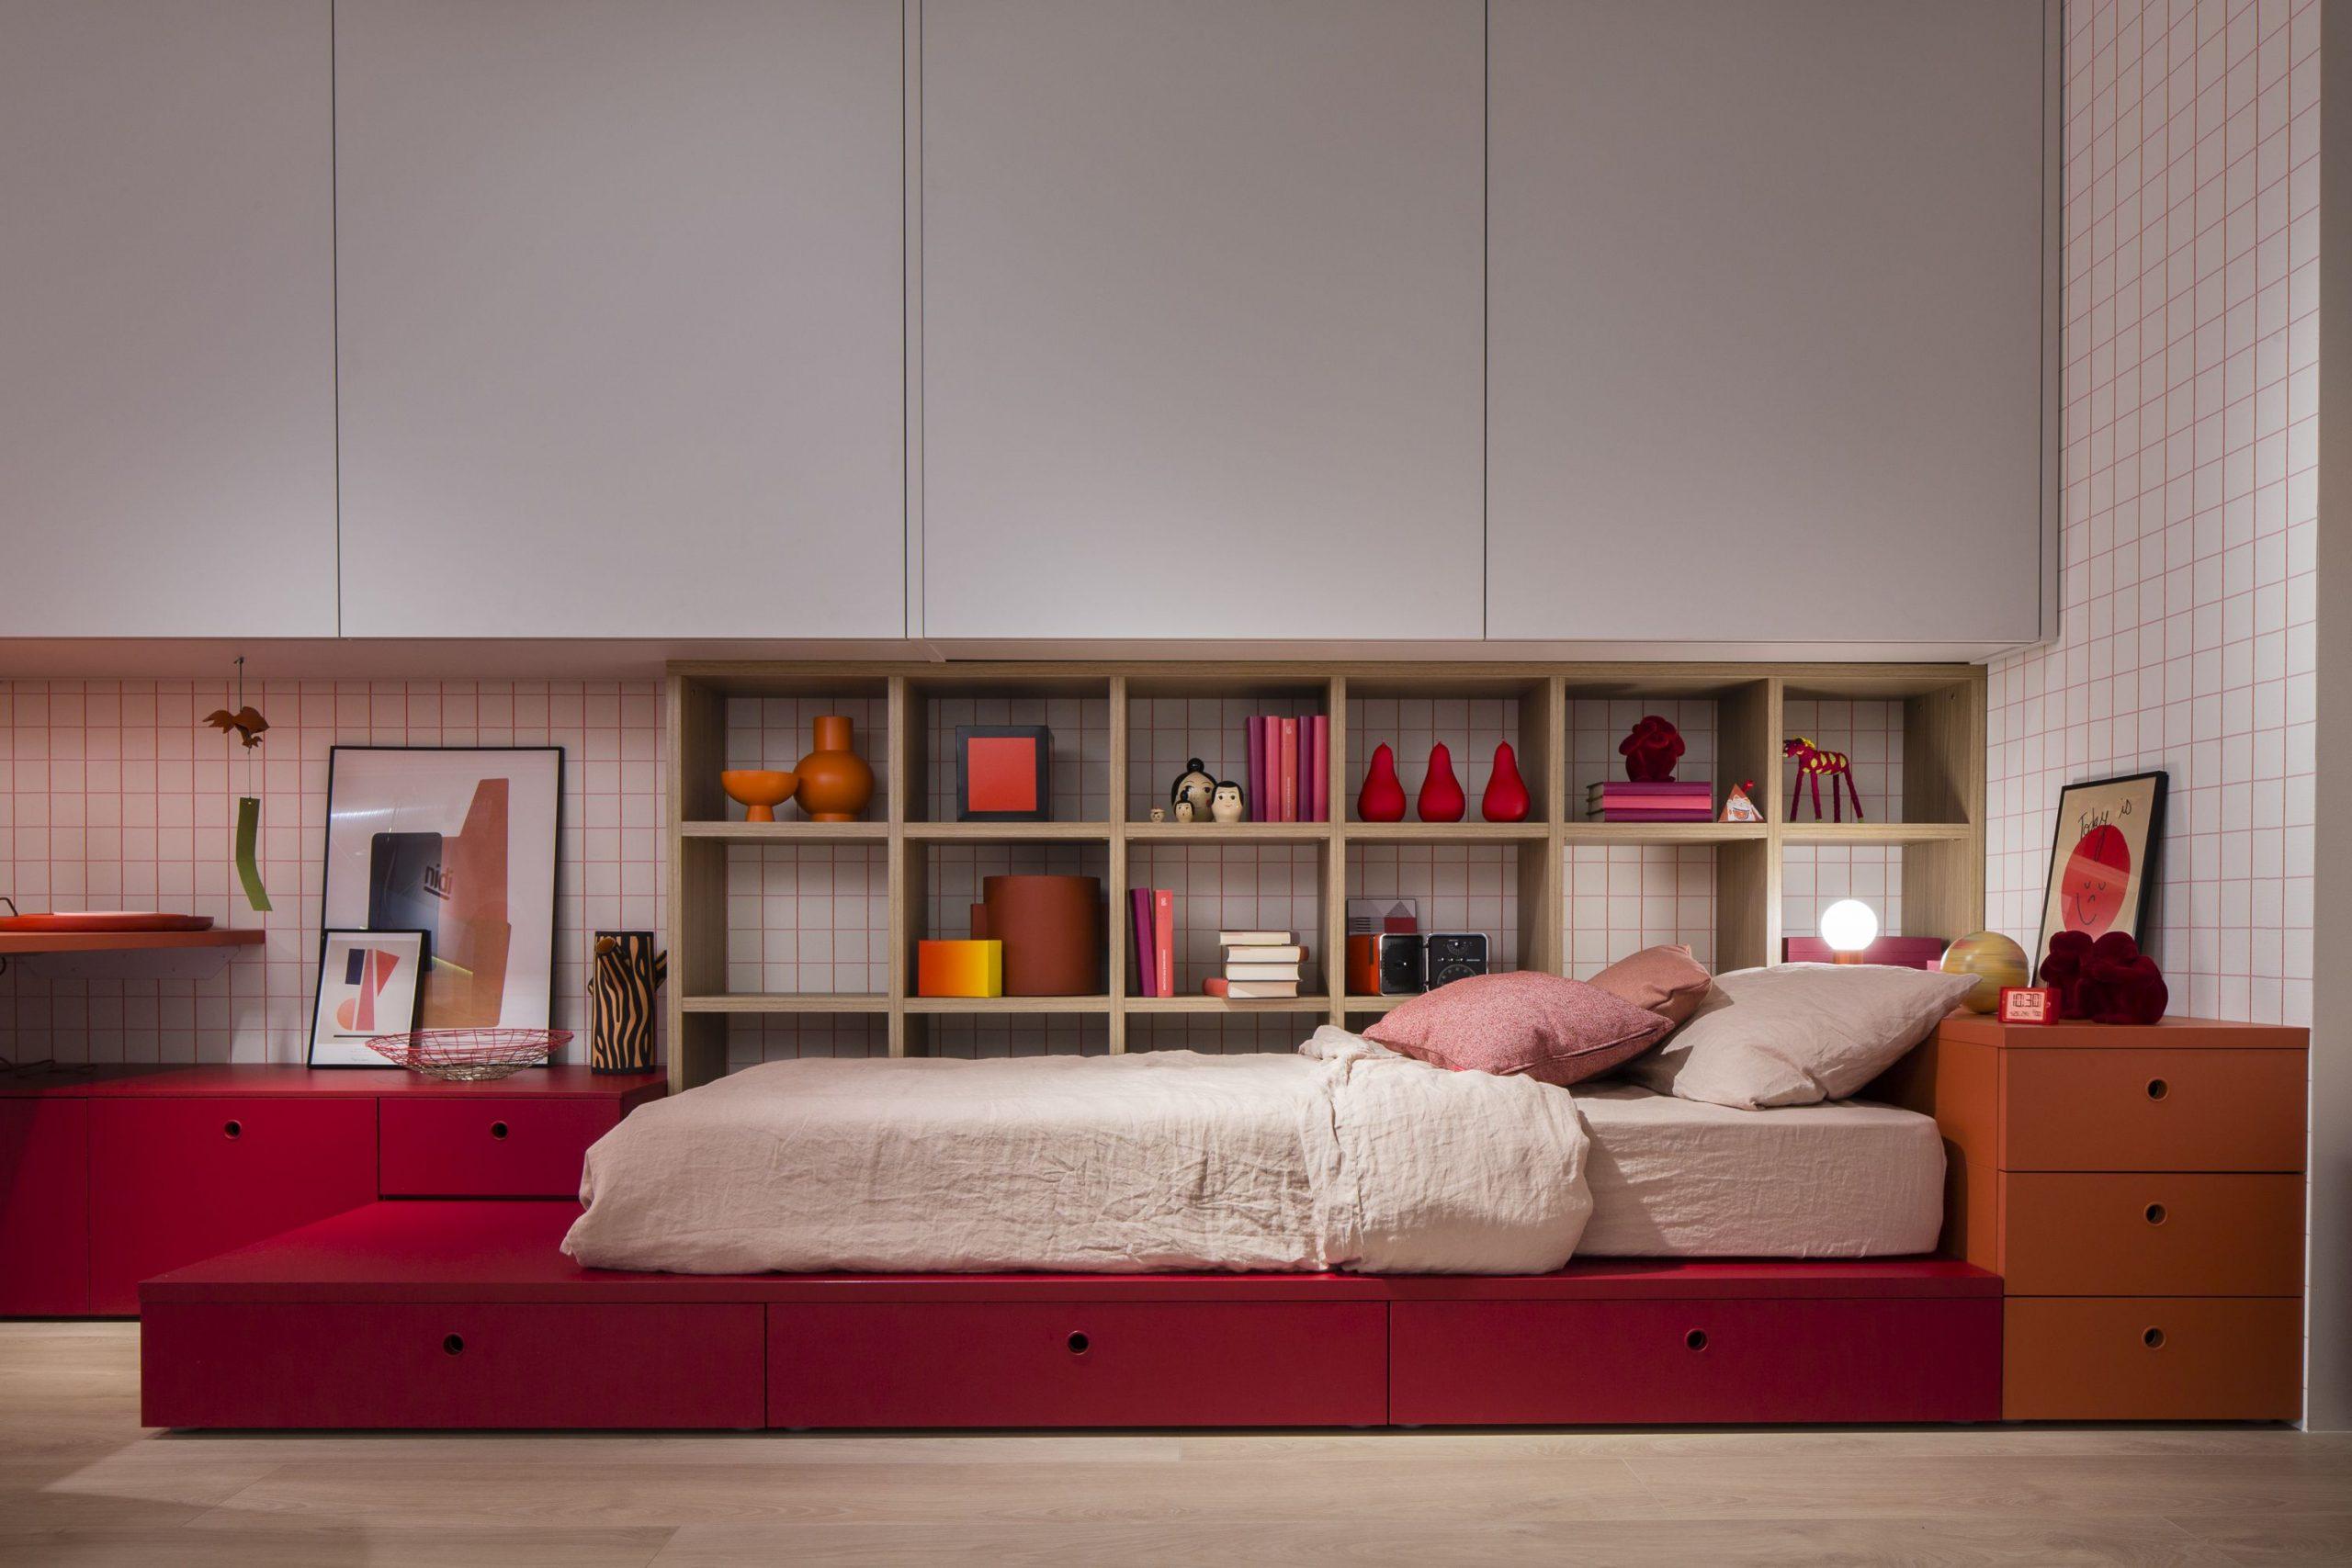 maison et objet 2020 Maison et Objet 2020: Take A Look At The Bedroom Design Trends NIDI 2 scaled